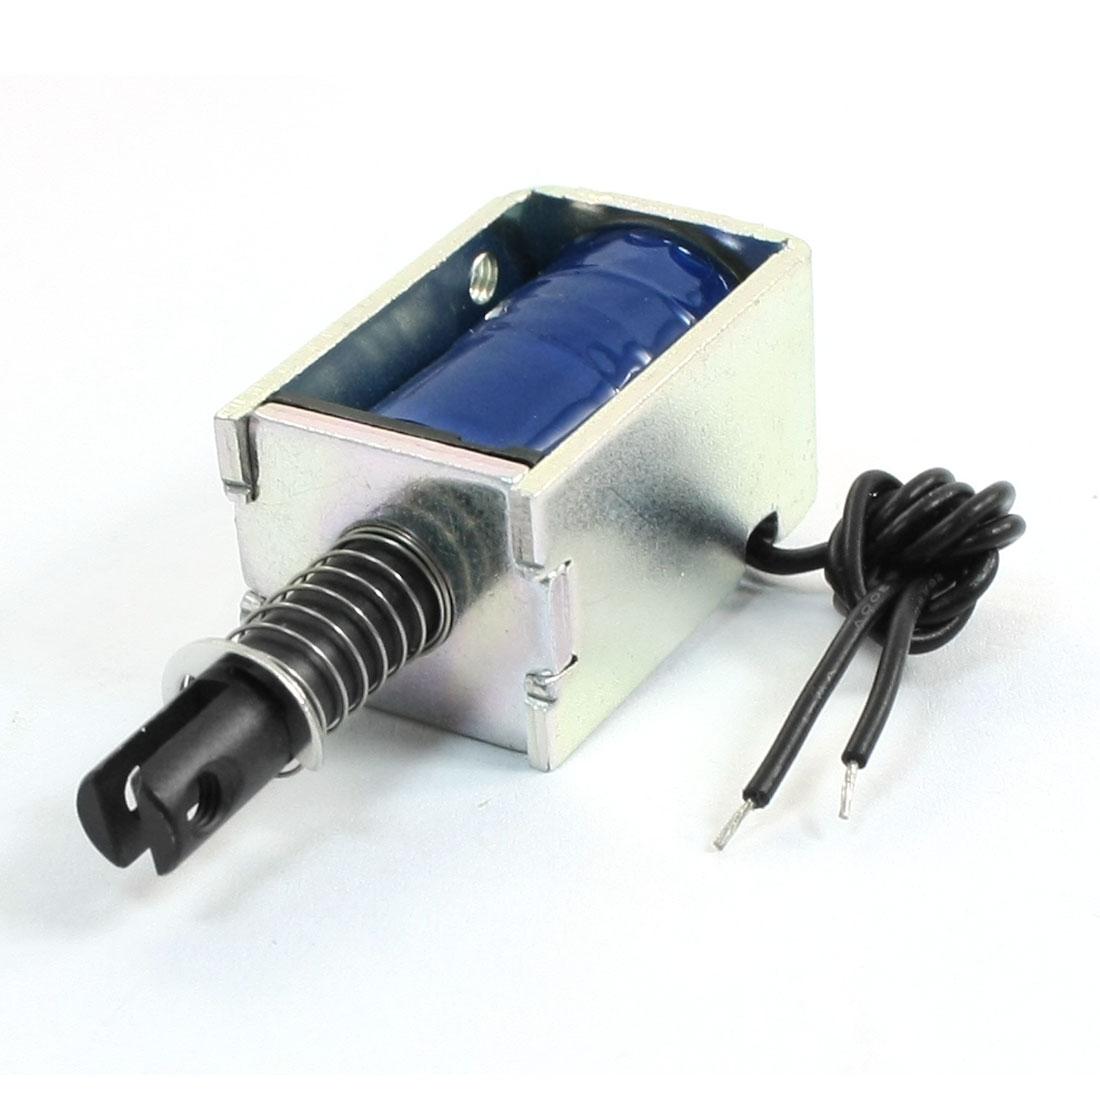 DC 24V 5mm 0.04lb Open Frame Push Pull Type Magnet Electromagnet Solenoid